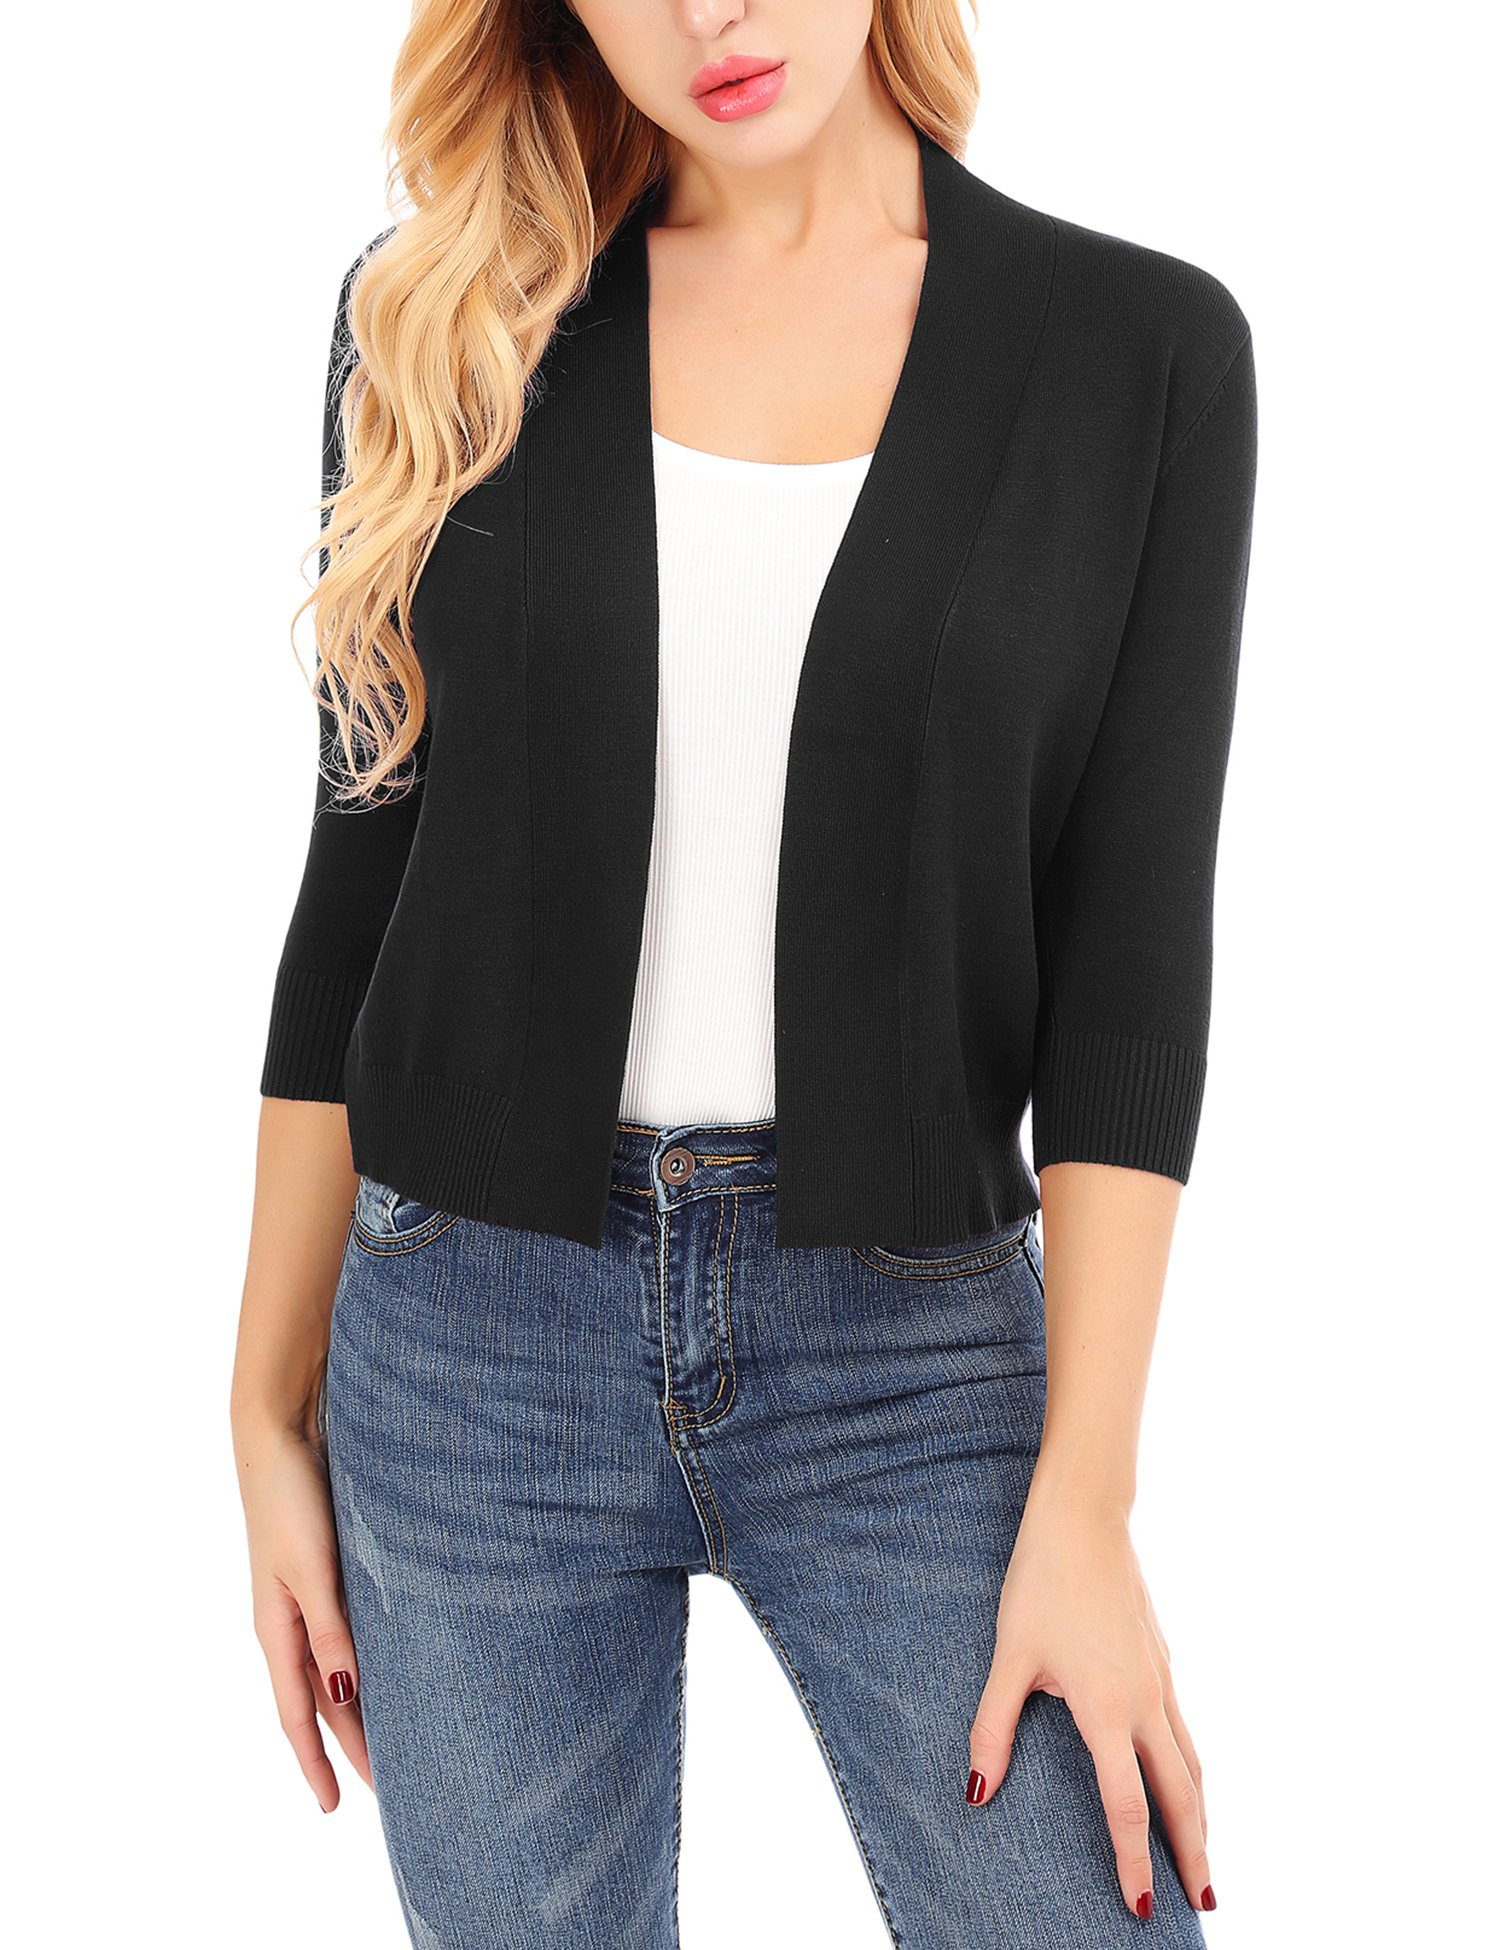 Uniboutique 3/4 Sleeve Open Cardigans Bolero Shrug for Women Soft Stretchy